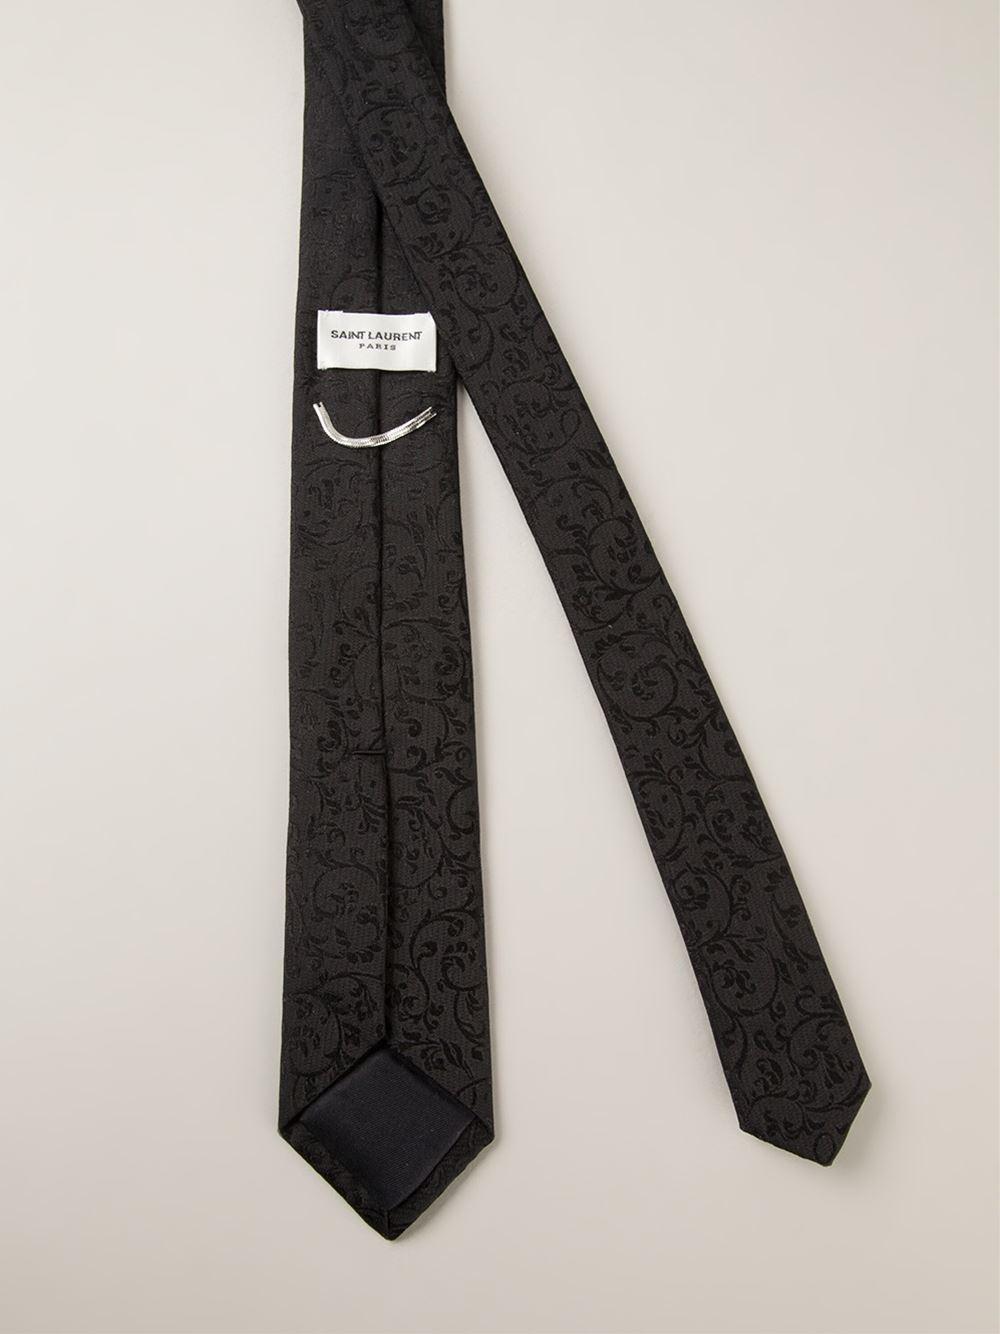 b06955a35a49f Lyst - Saint Laurent Baroque Jacquard Tie in Black for Men